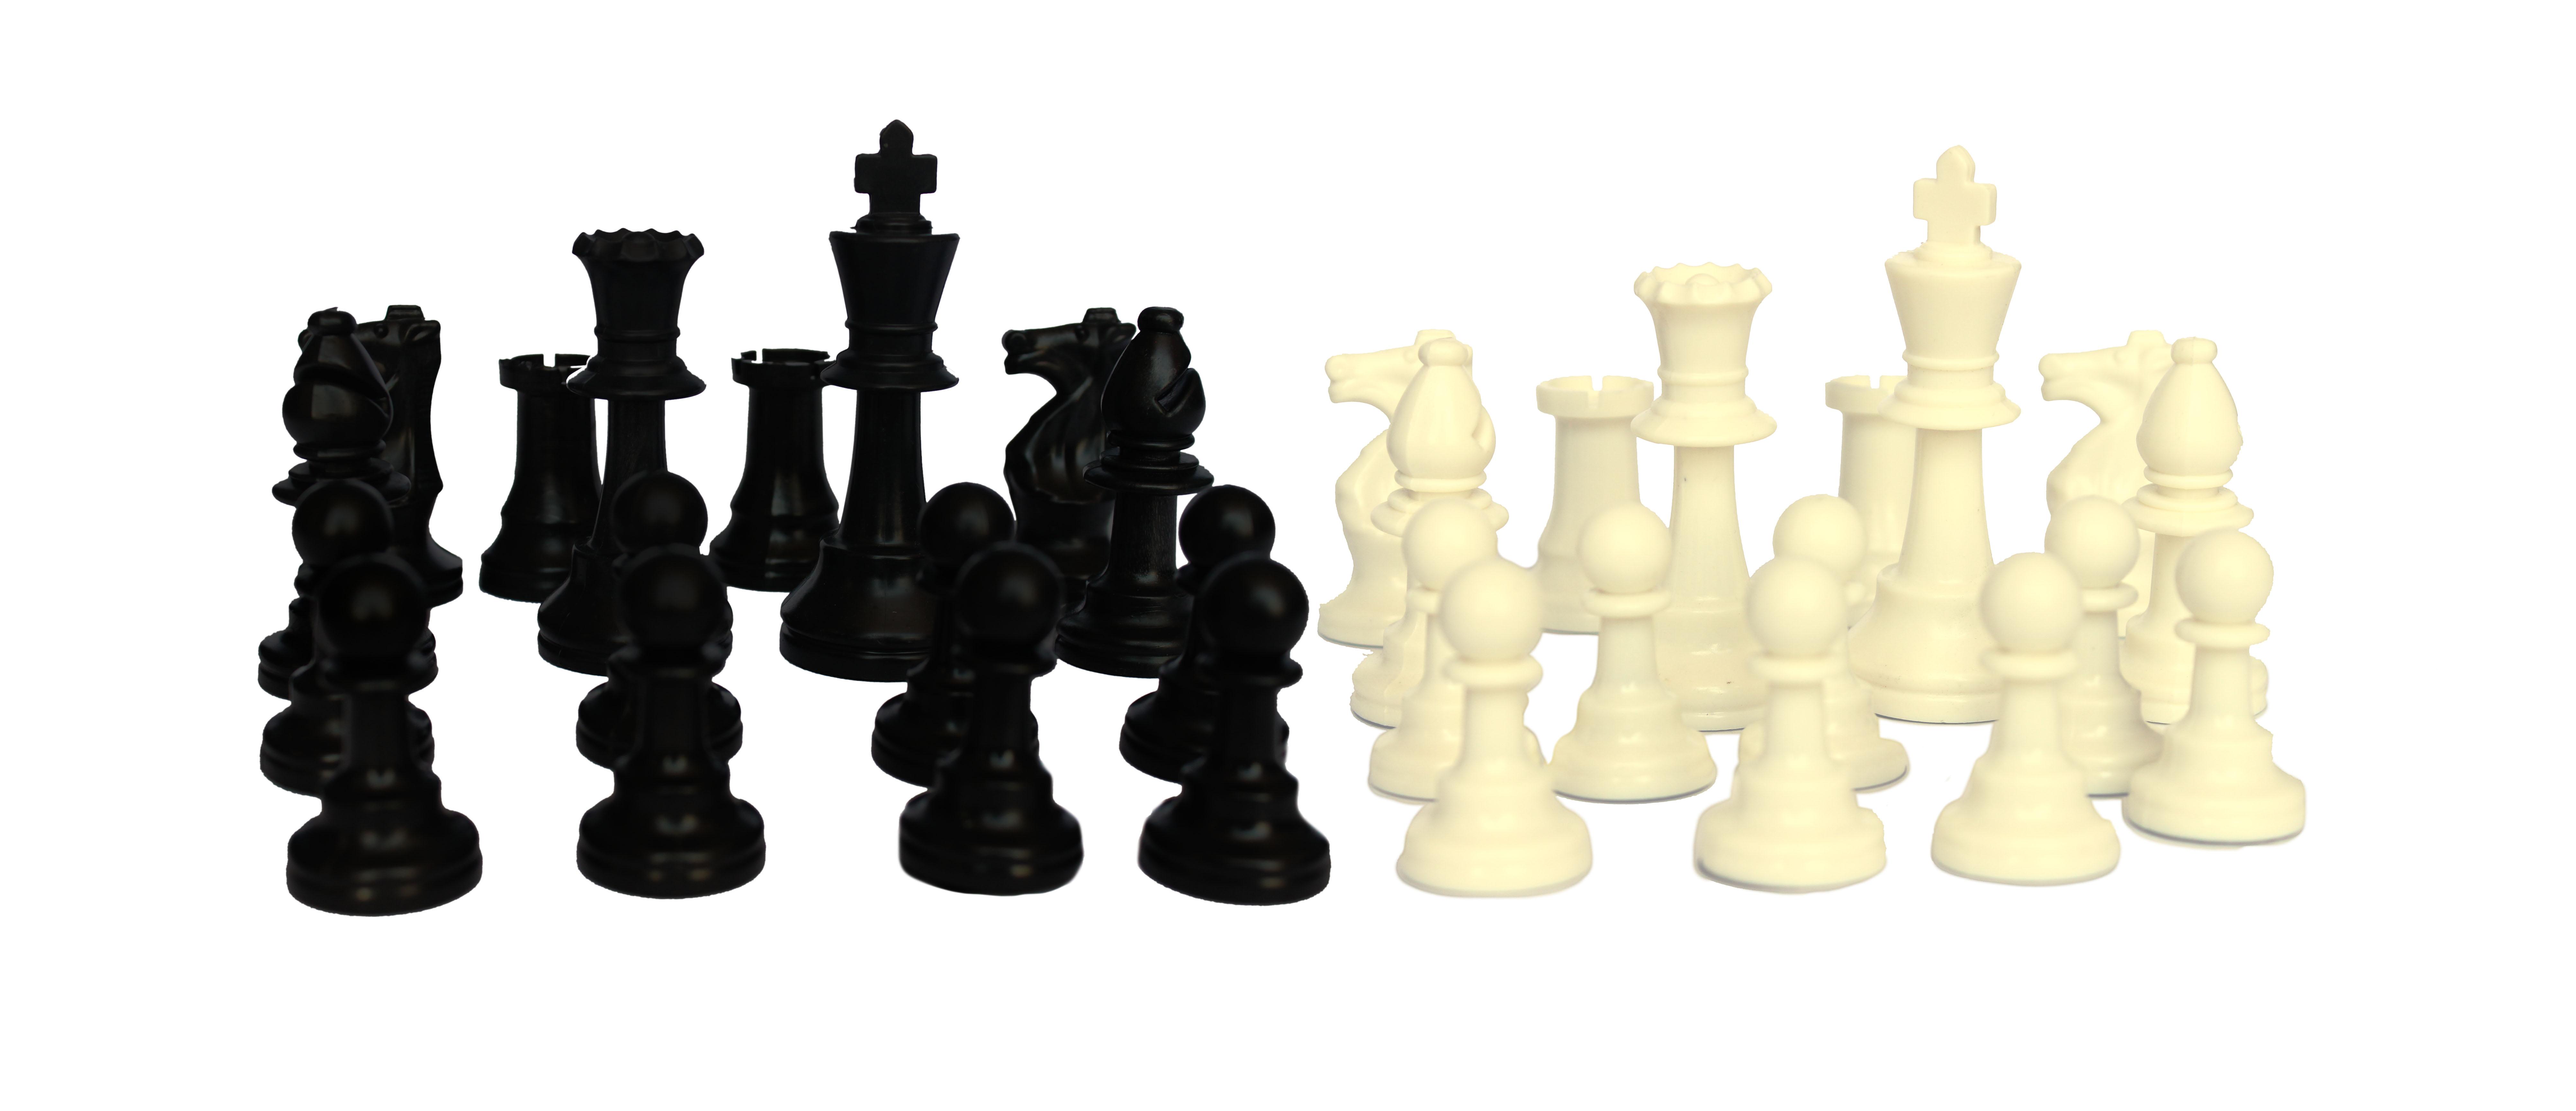 Piezas de ajedrez de SILICONA tamaño oficial